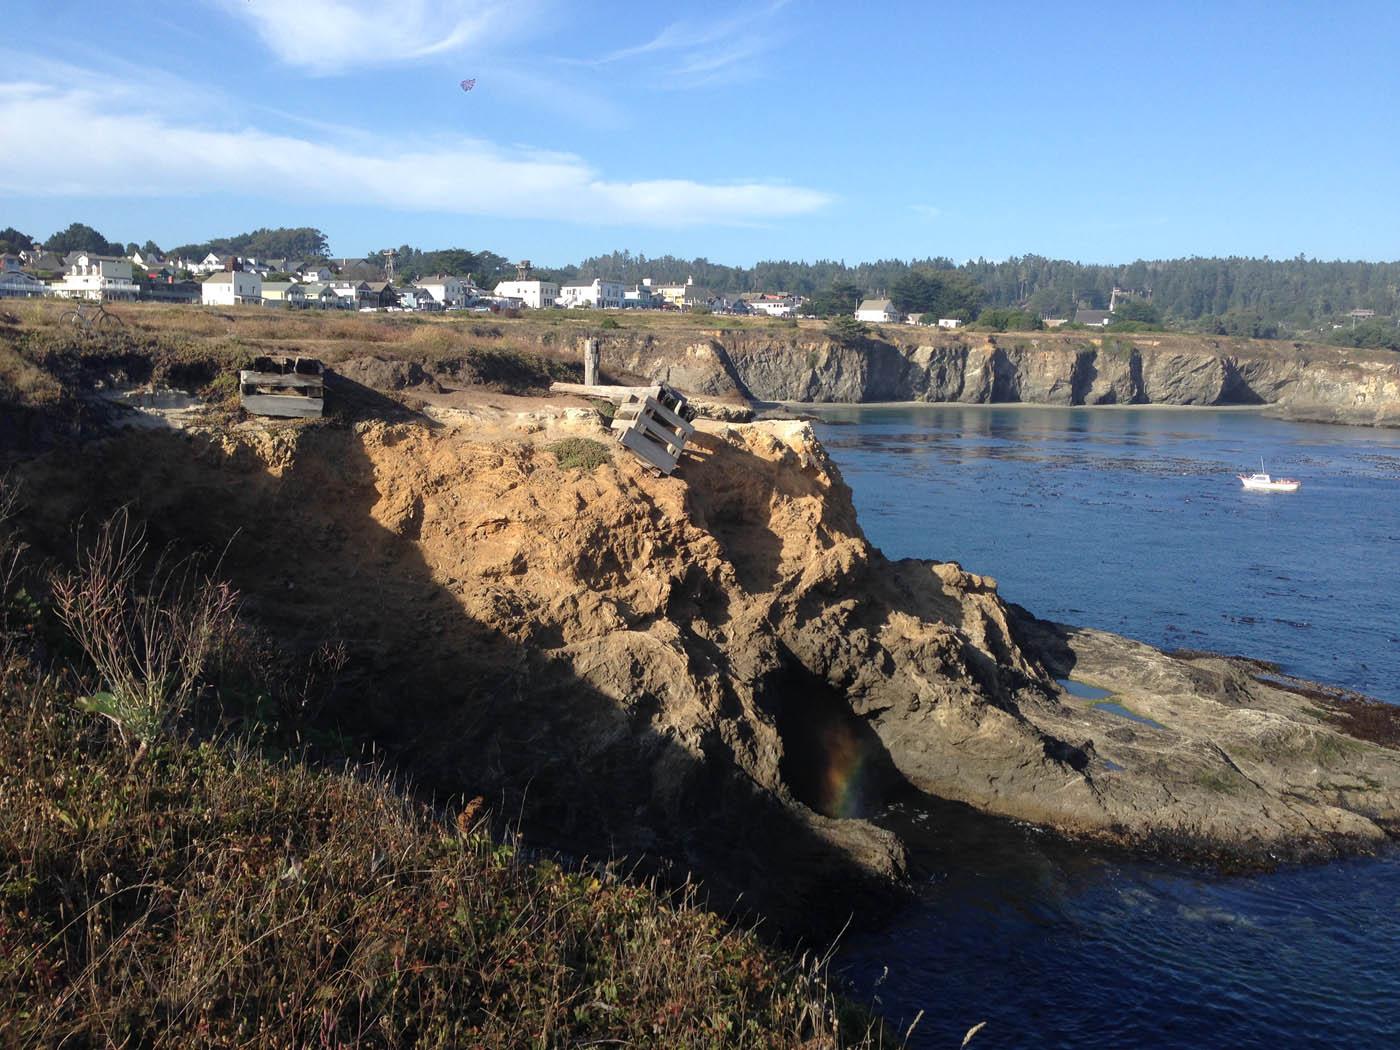 Mendocino bay chute remnantsS